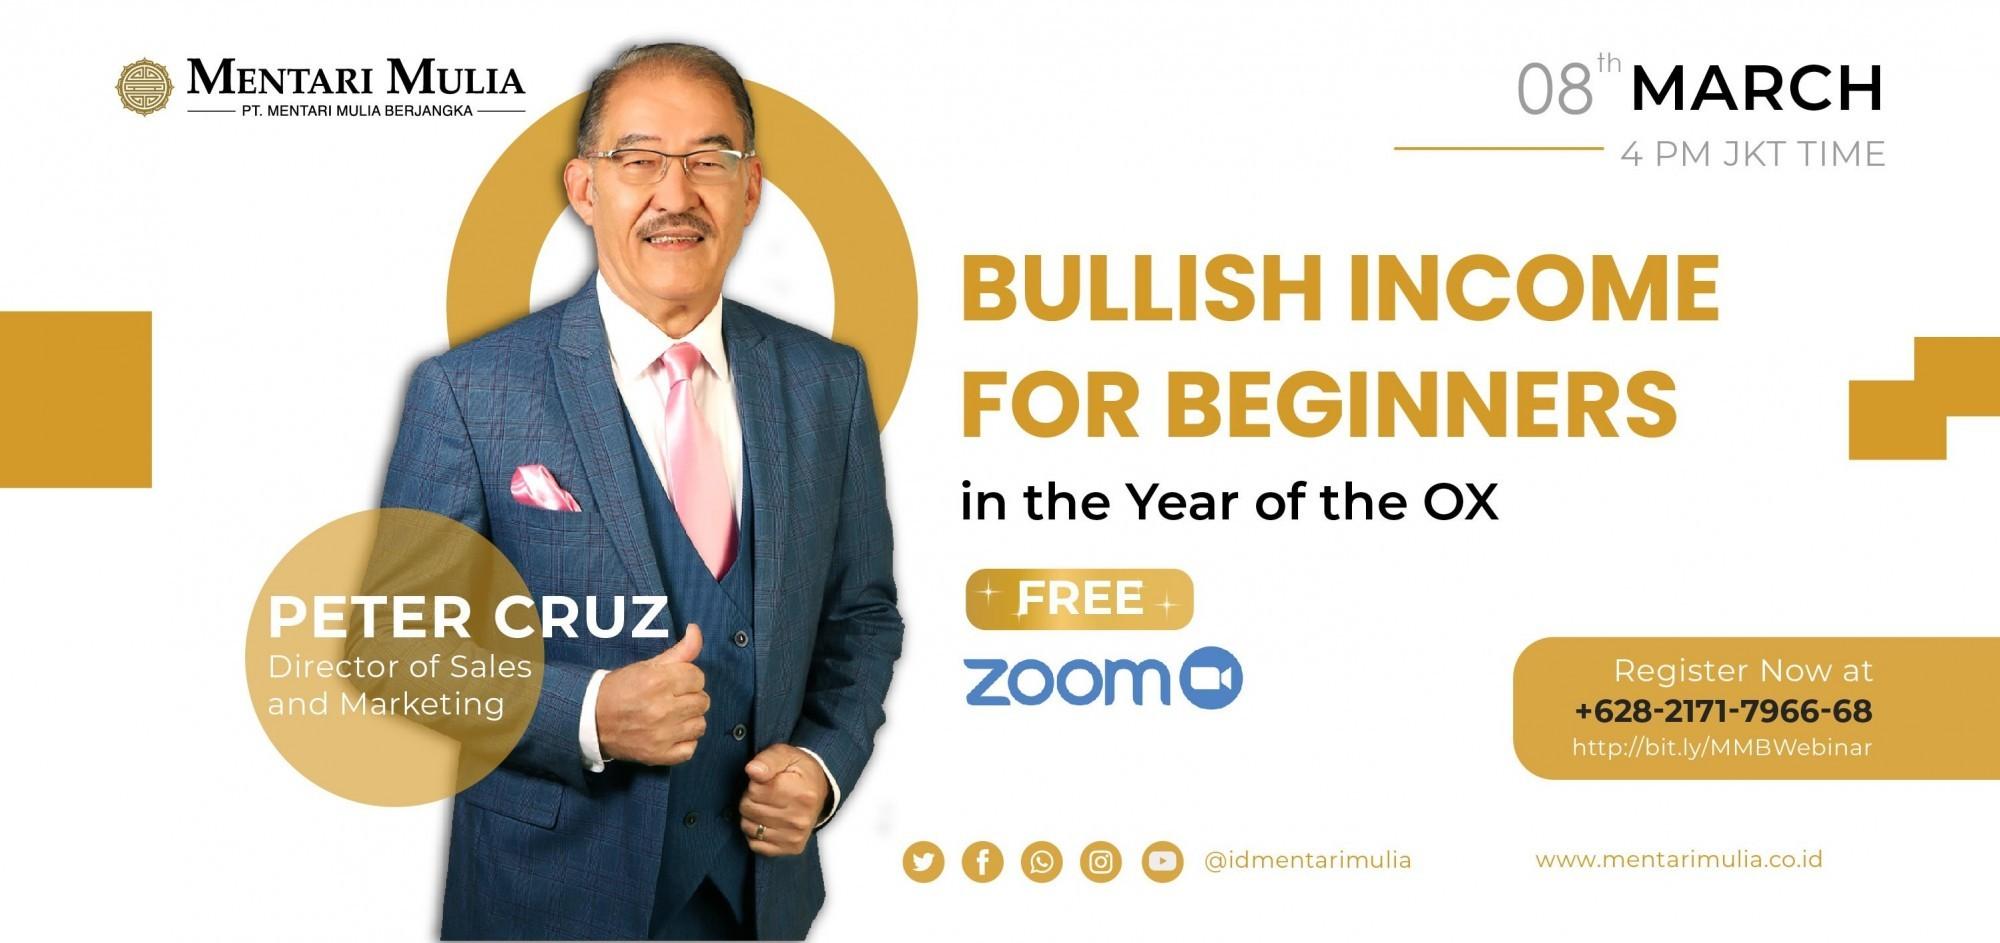 Bullish Income for Beginners